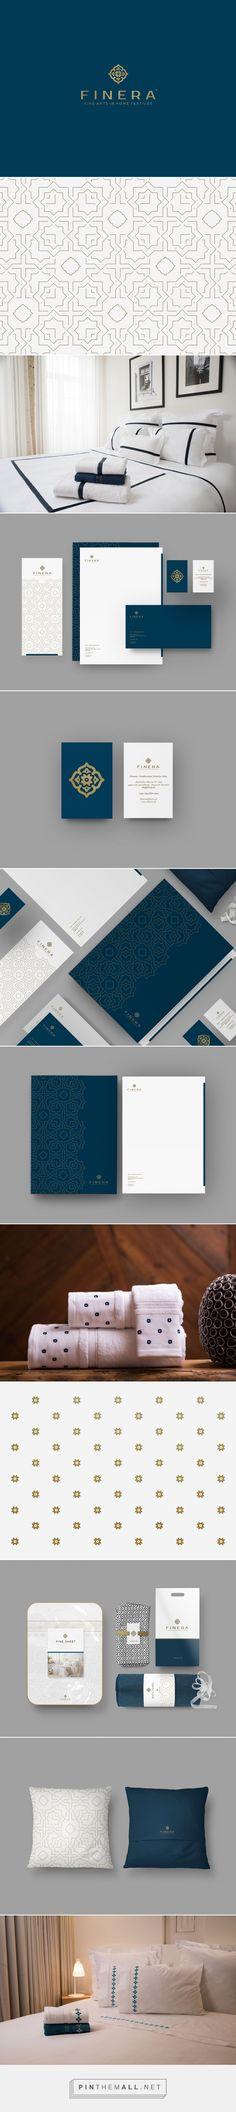 Finera Home Textile Branding by Bullseye   Fivestar Branding Agency – Design and Branding Agency & Curated Inspiration Gallery